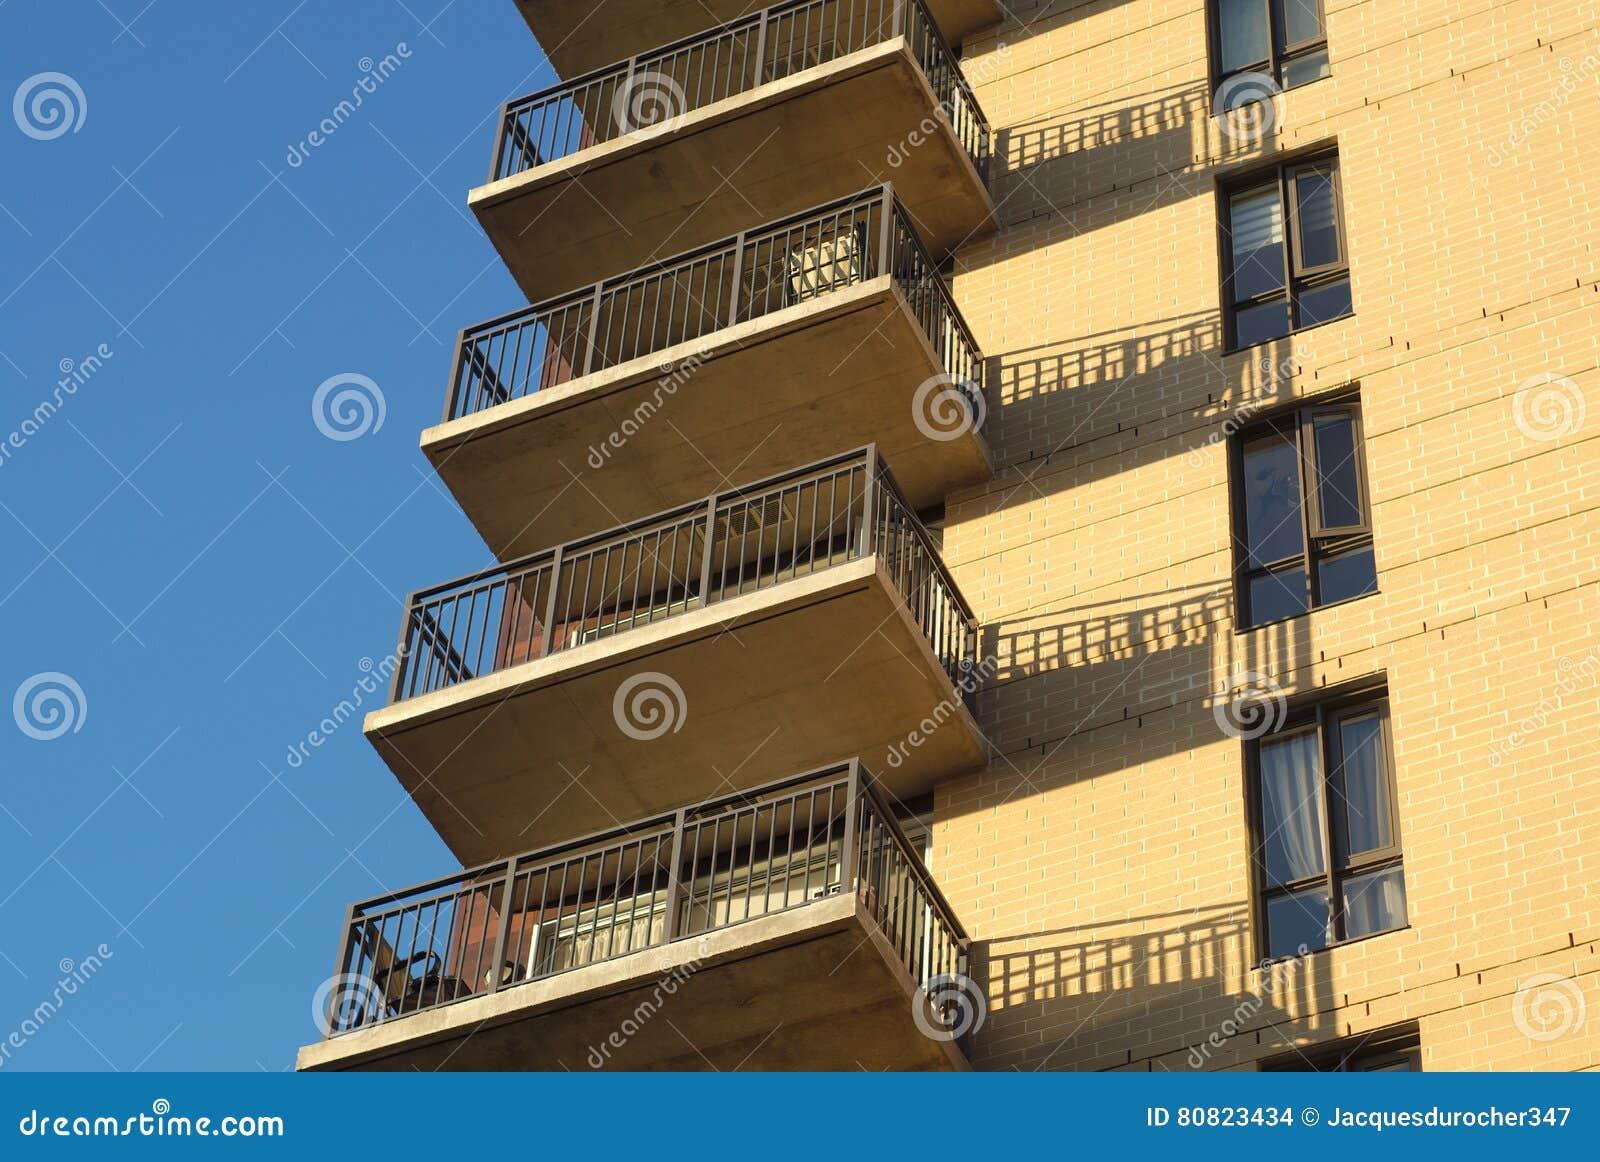 Residential Building Balconies Condominium Apartments Modern